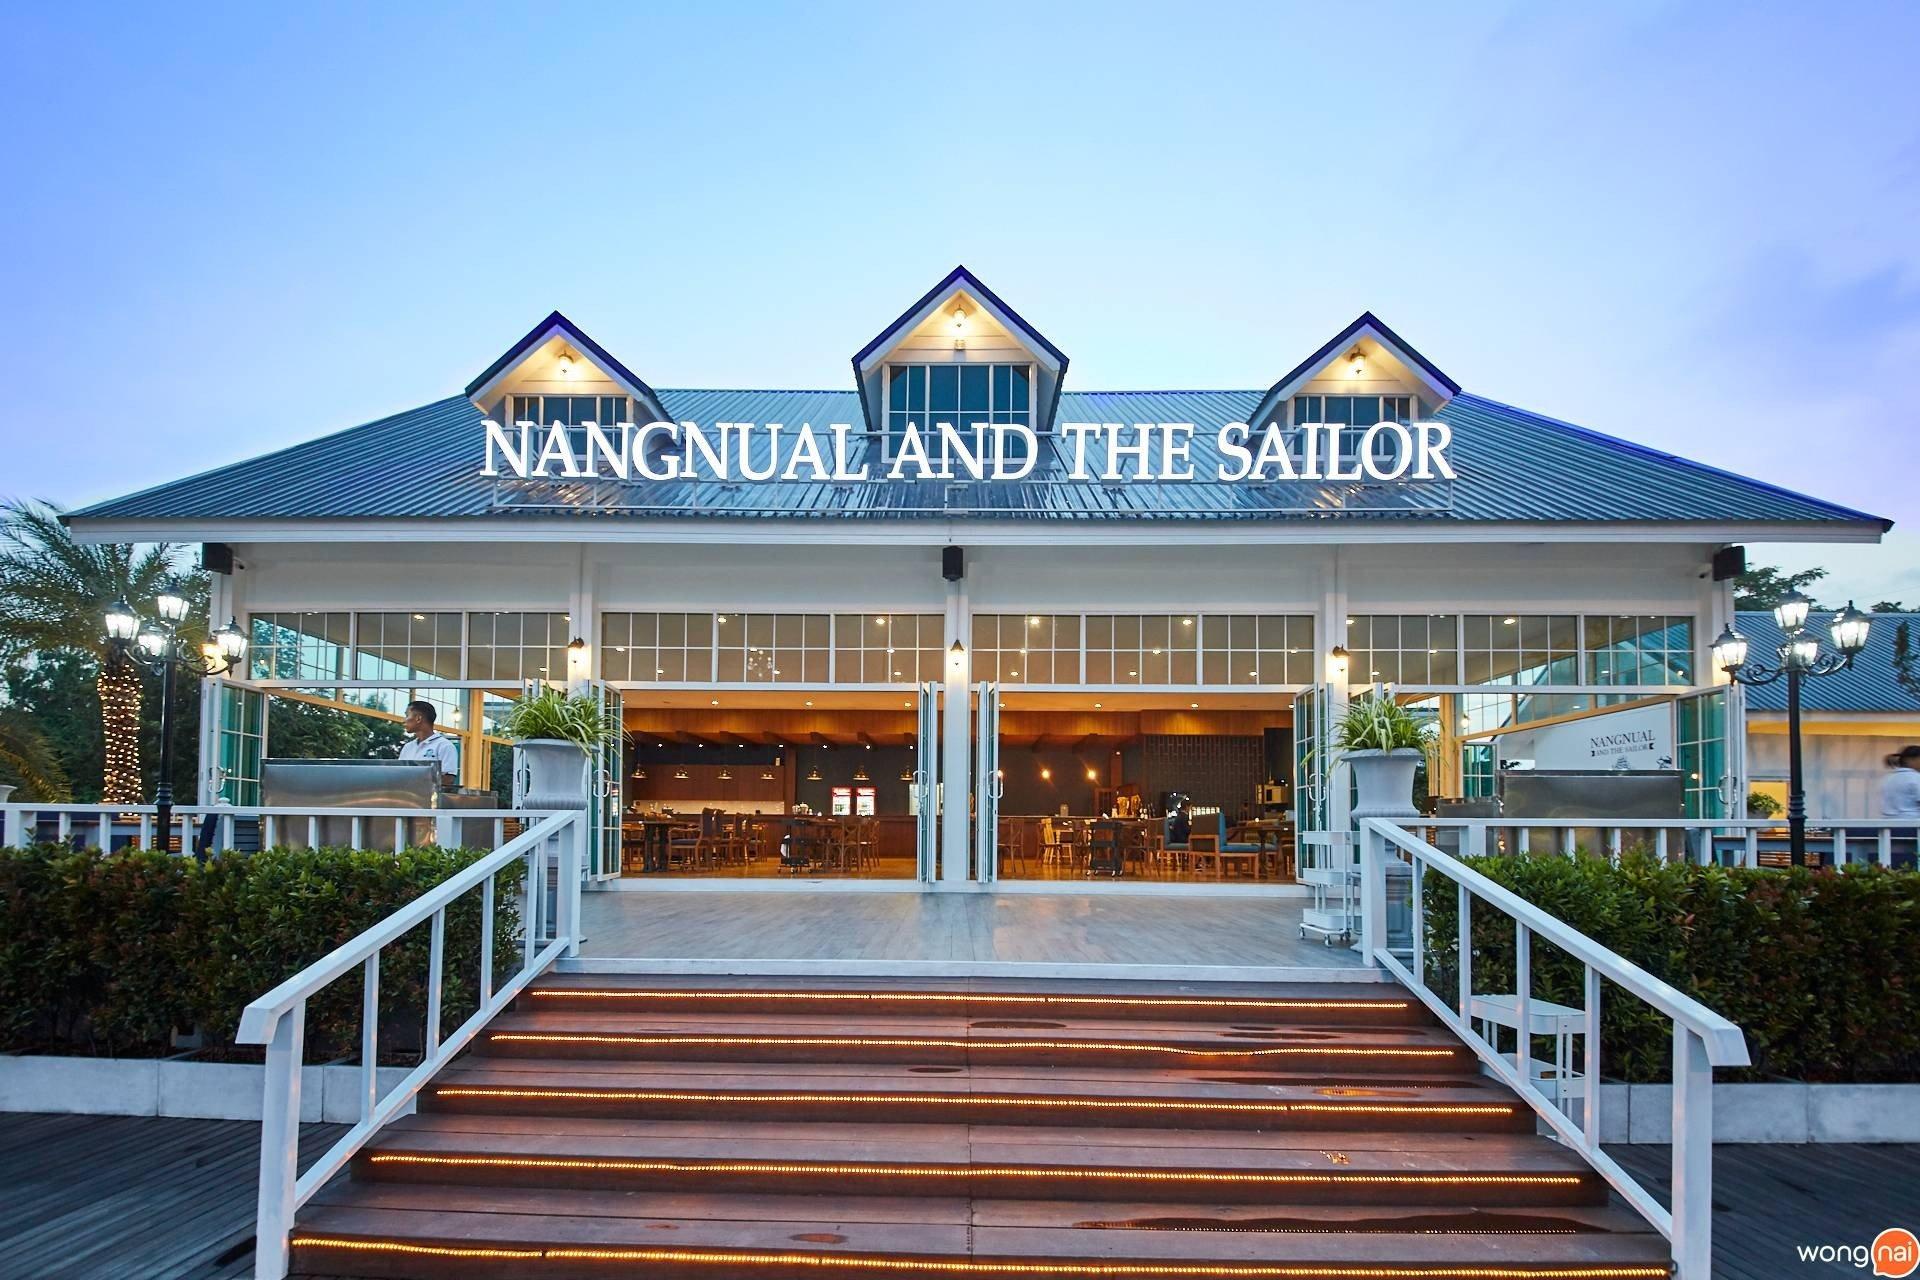 Nangnual and the Sailor